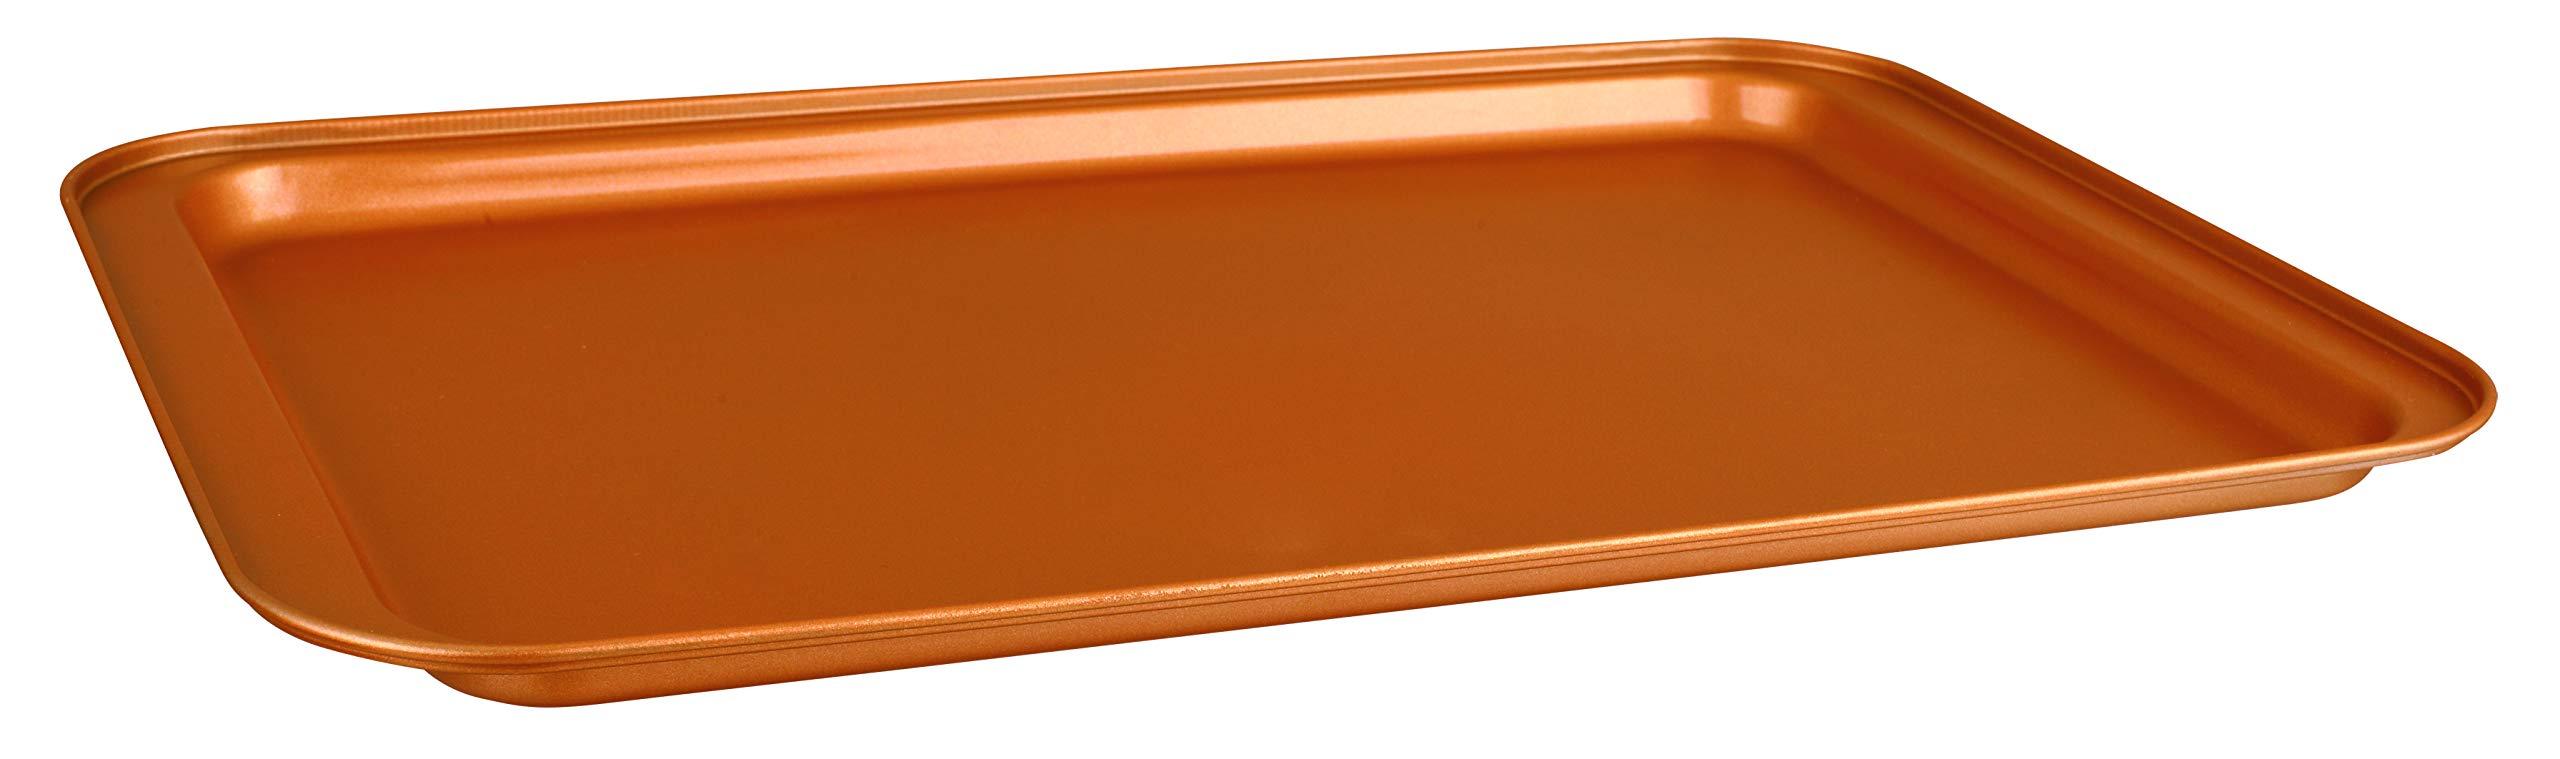 CopperKitchen Baking Pans - 3 pcs Toxic Free NONSTICK - Organic Environmental Friendly Premium Coating - Durable Quality - Rectangle Pan, Cookie Sheet - BAKEWARE SET (3) by CopperKitchenUSA (Image #2)